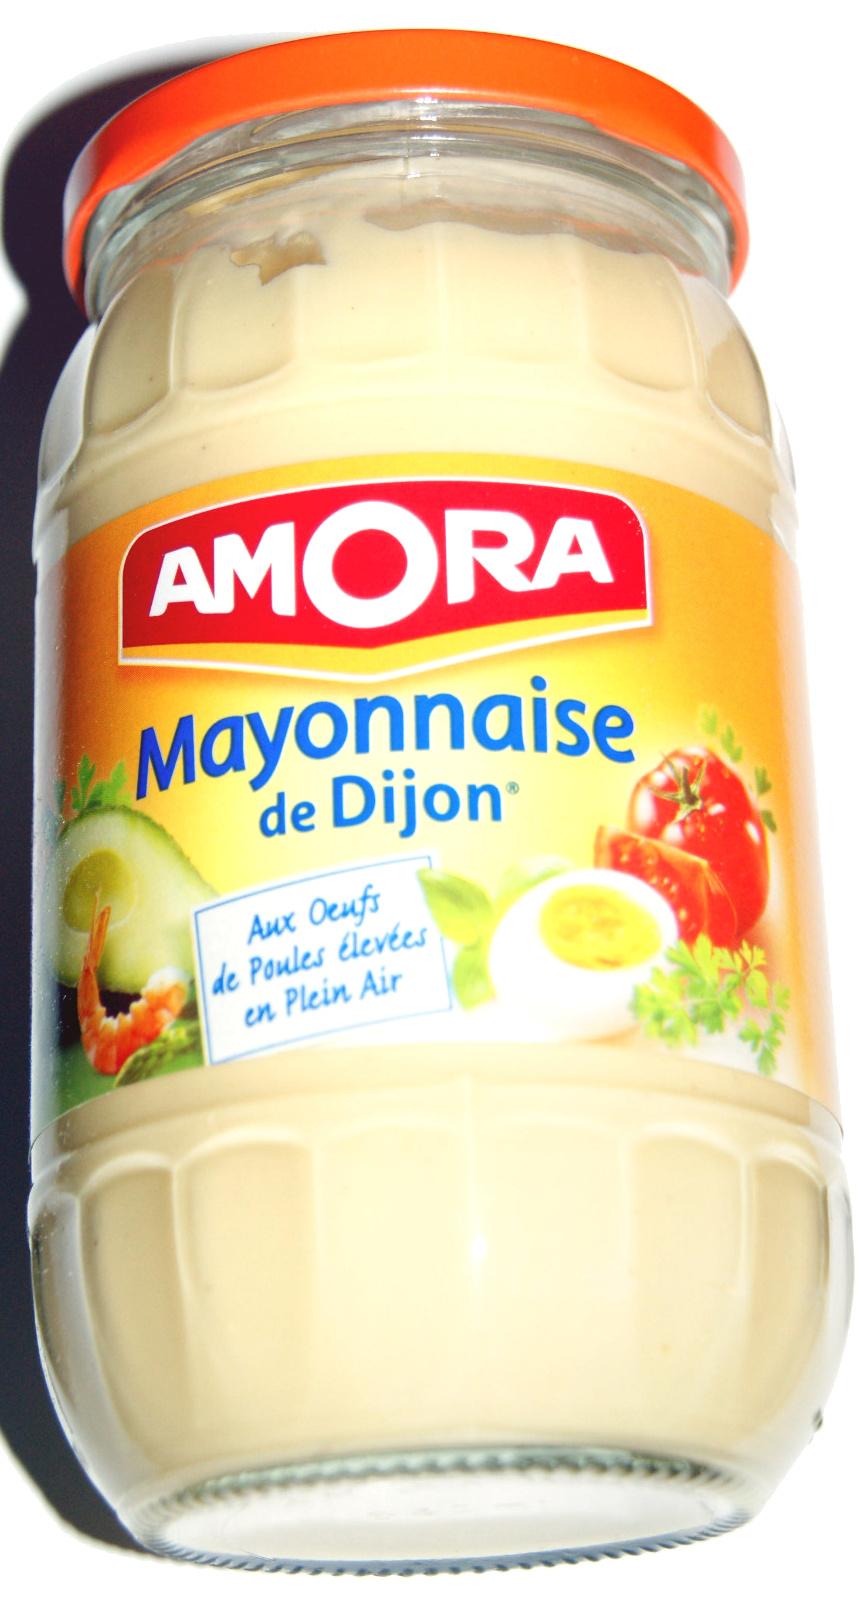 Mayonnaise de Dijon - Product